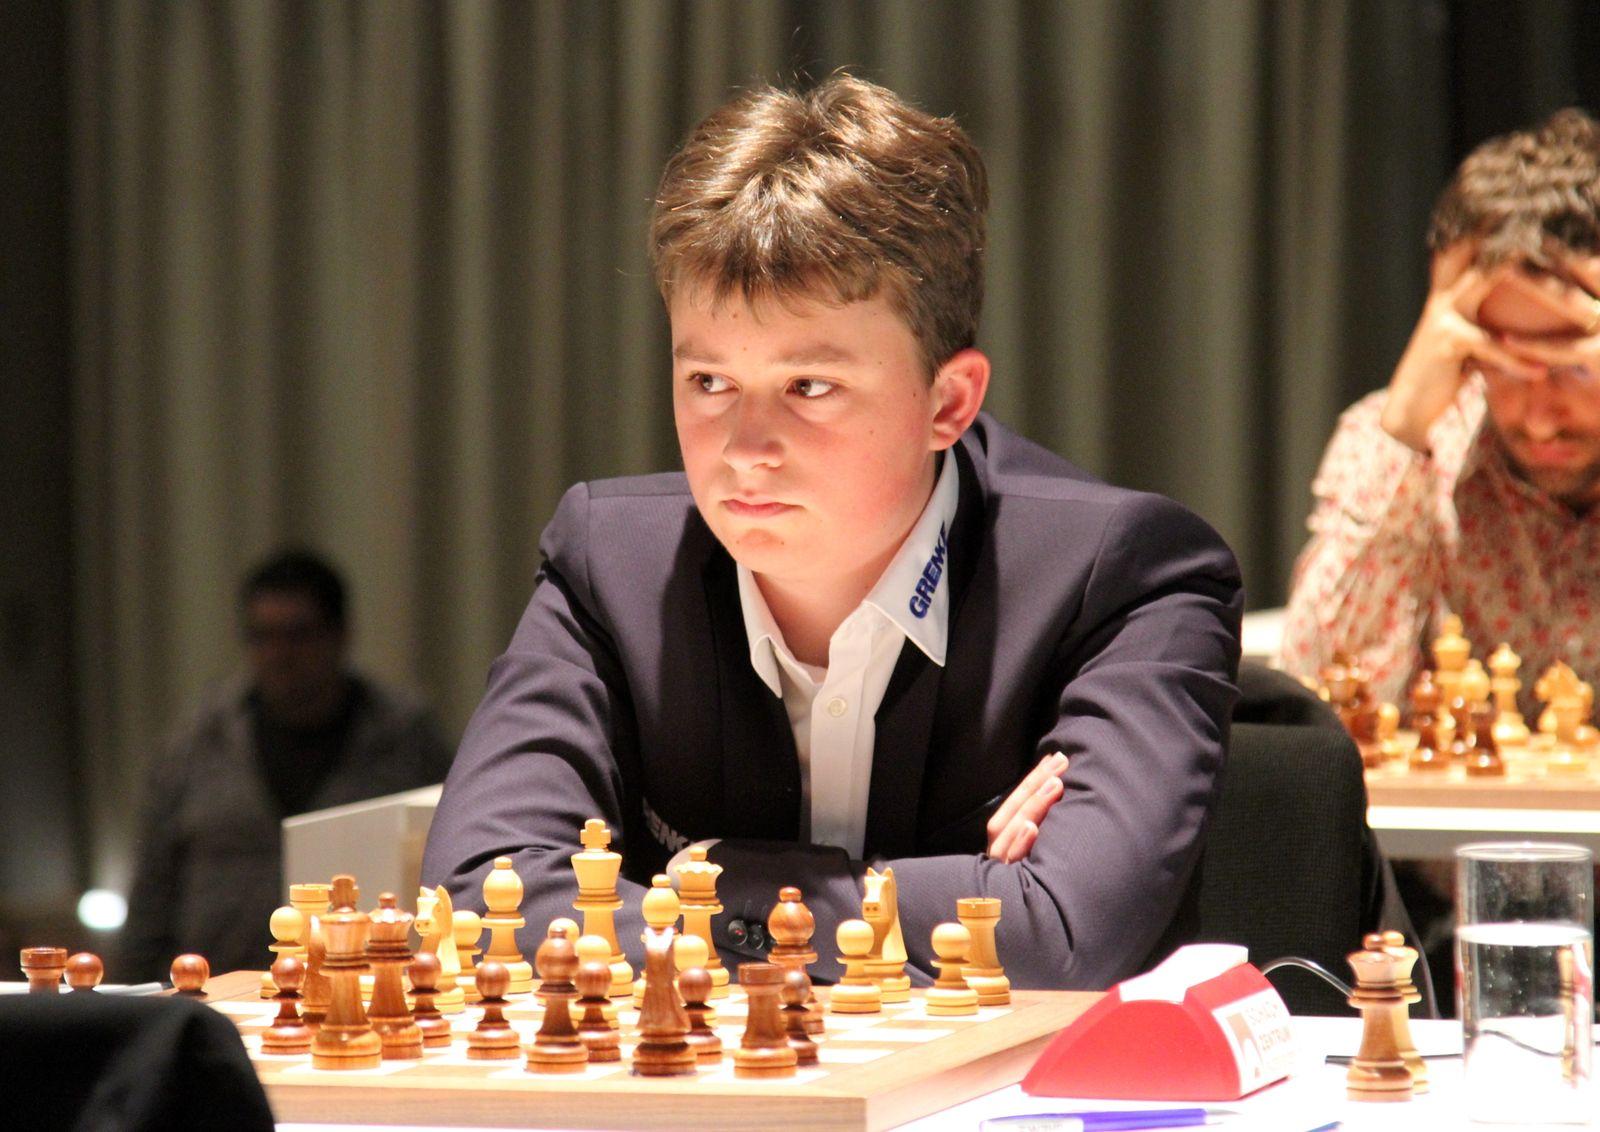 Schach - Vincent Keymer